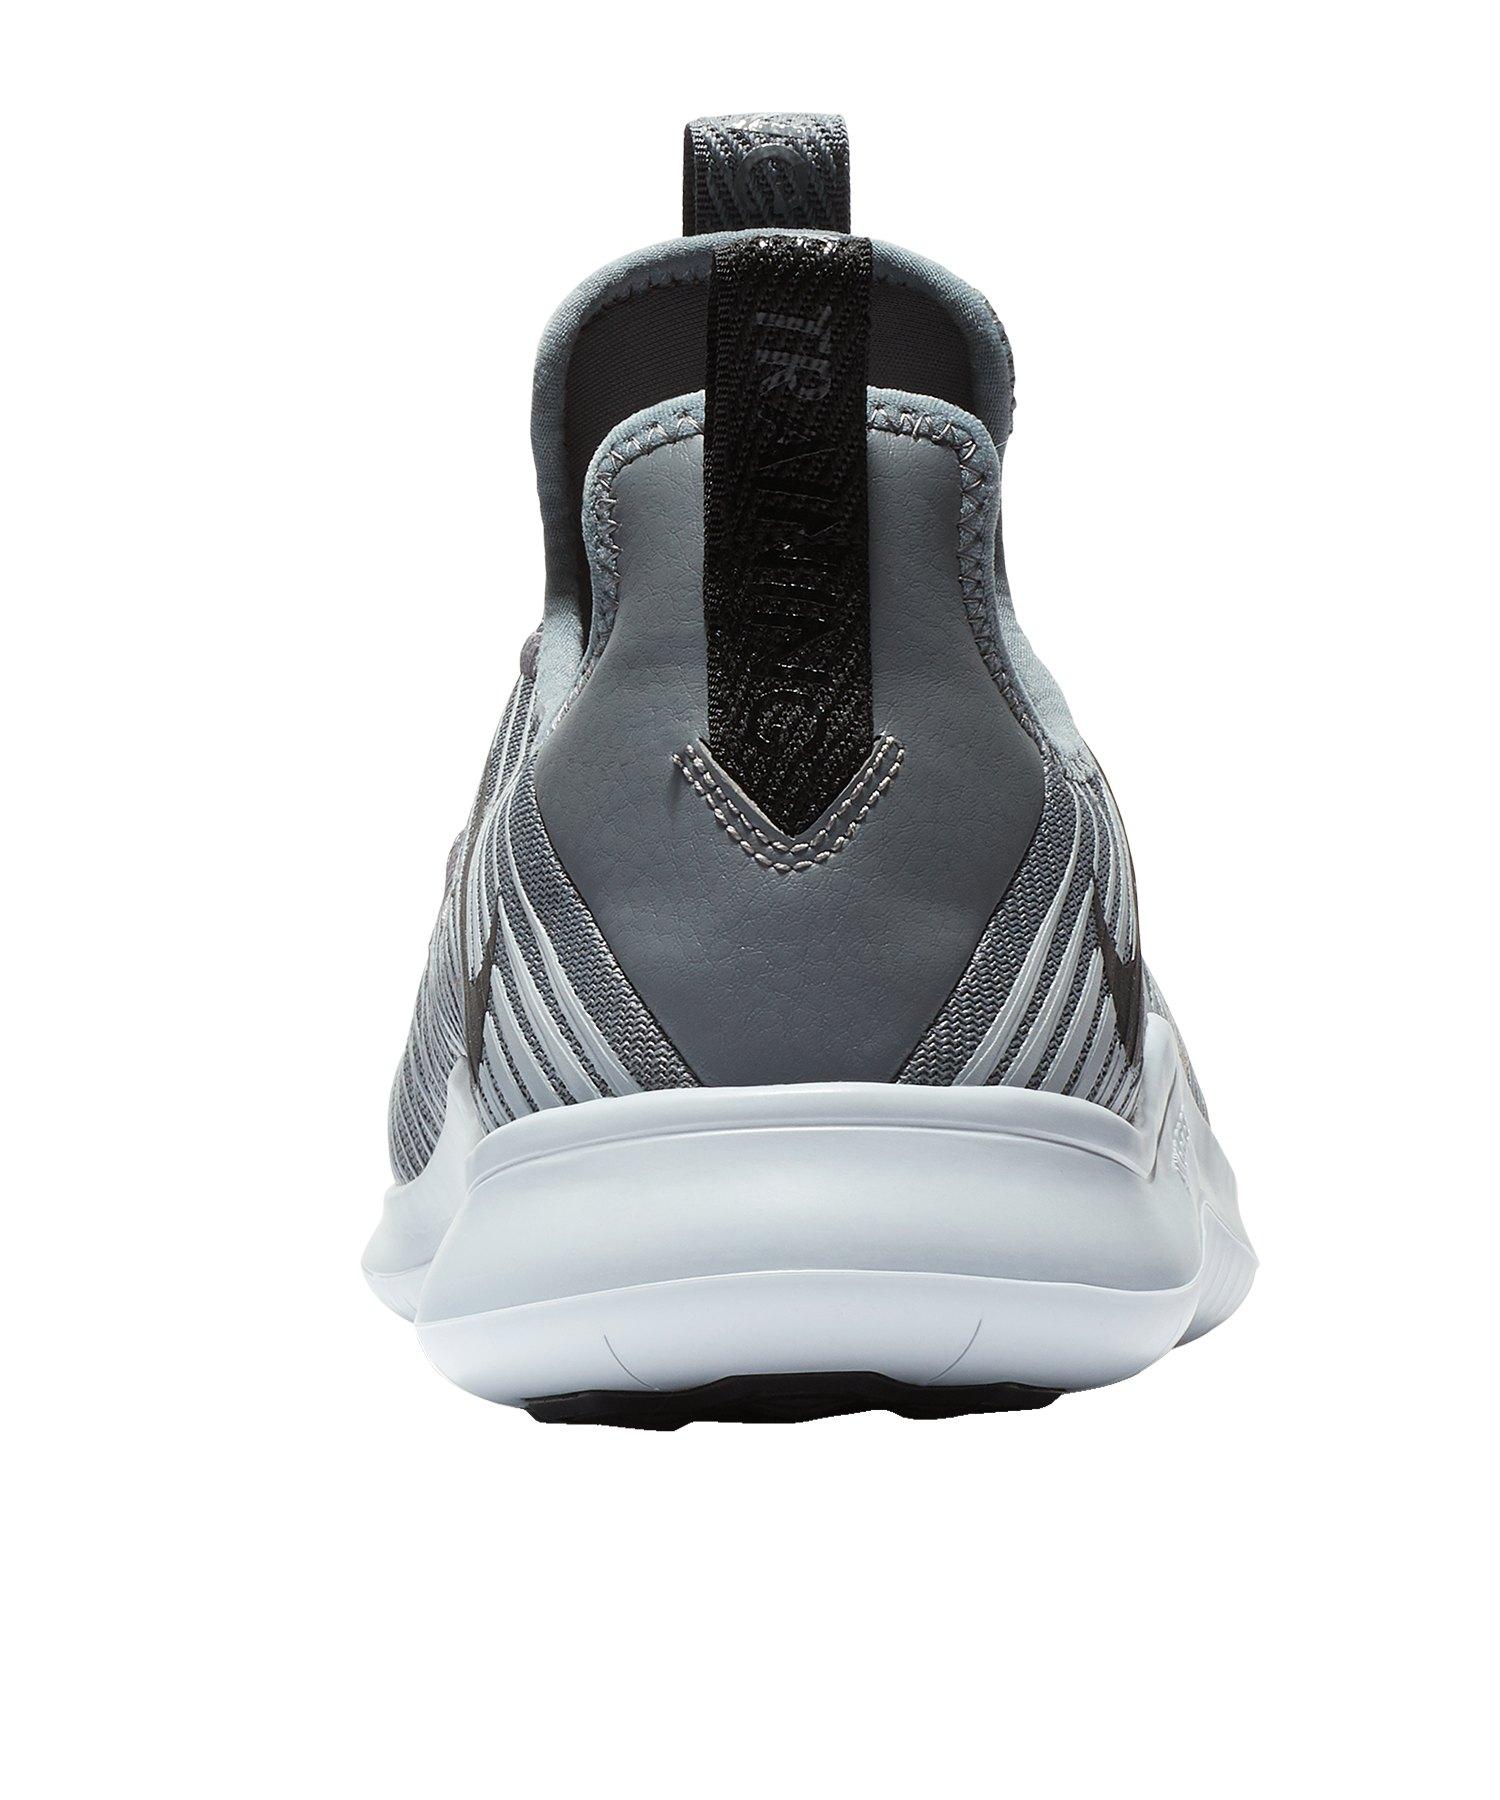 new styles ab785 95f9d ... Nike Free TR 9 Training Schwarz Grau F002 - schwarz ...